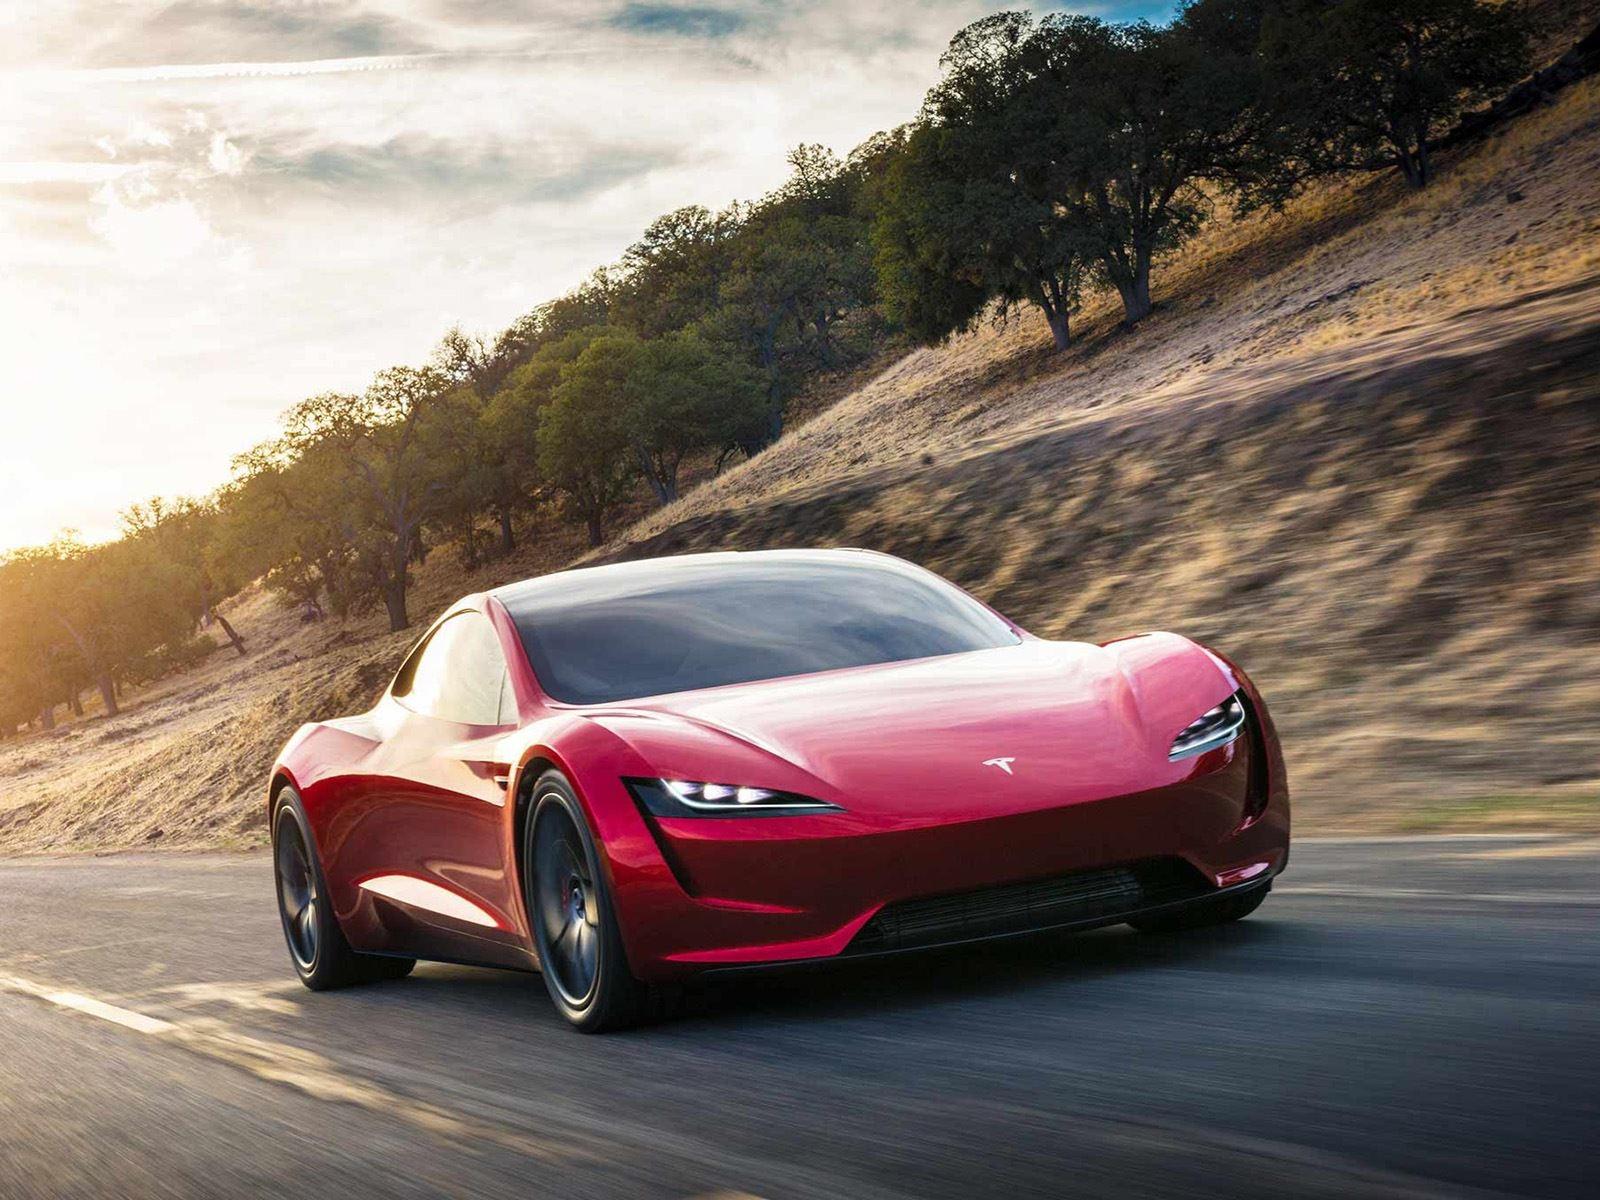 Tesla Turns To Israel For Cutting-Edge Tech